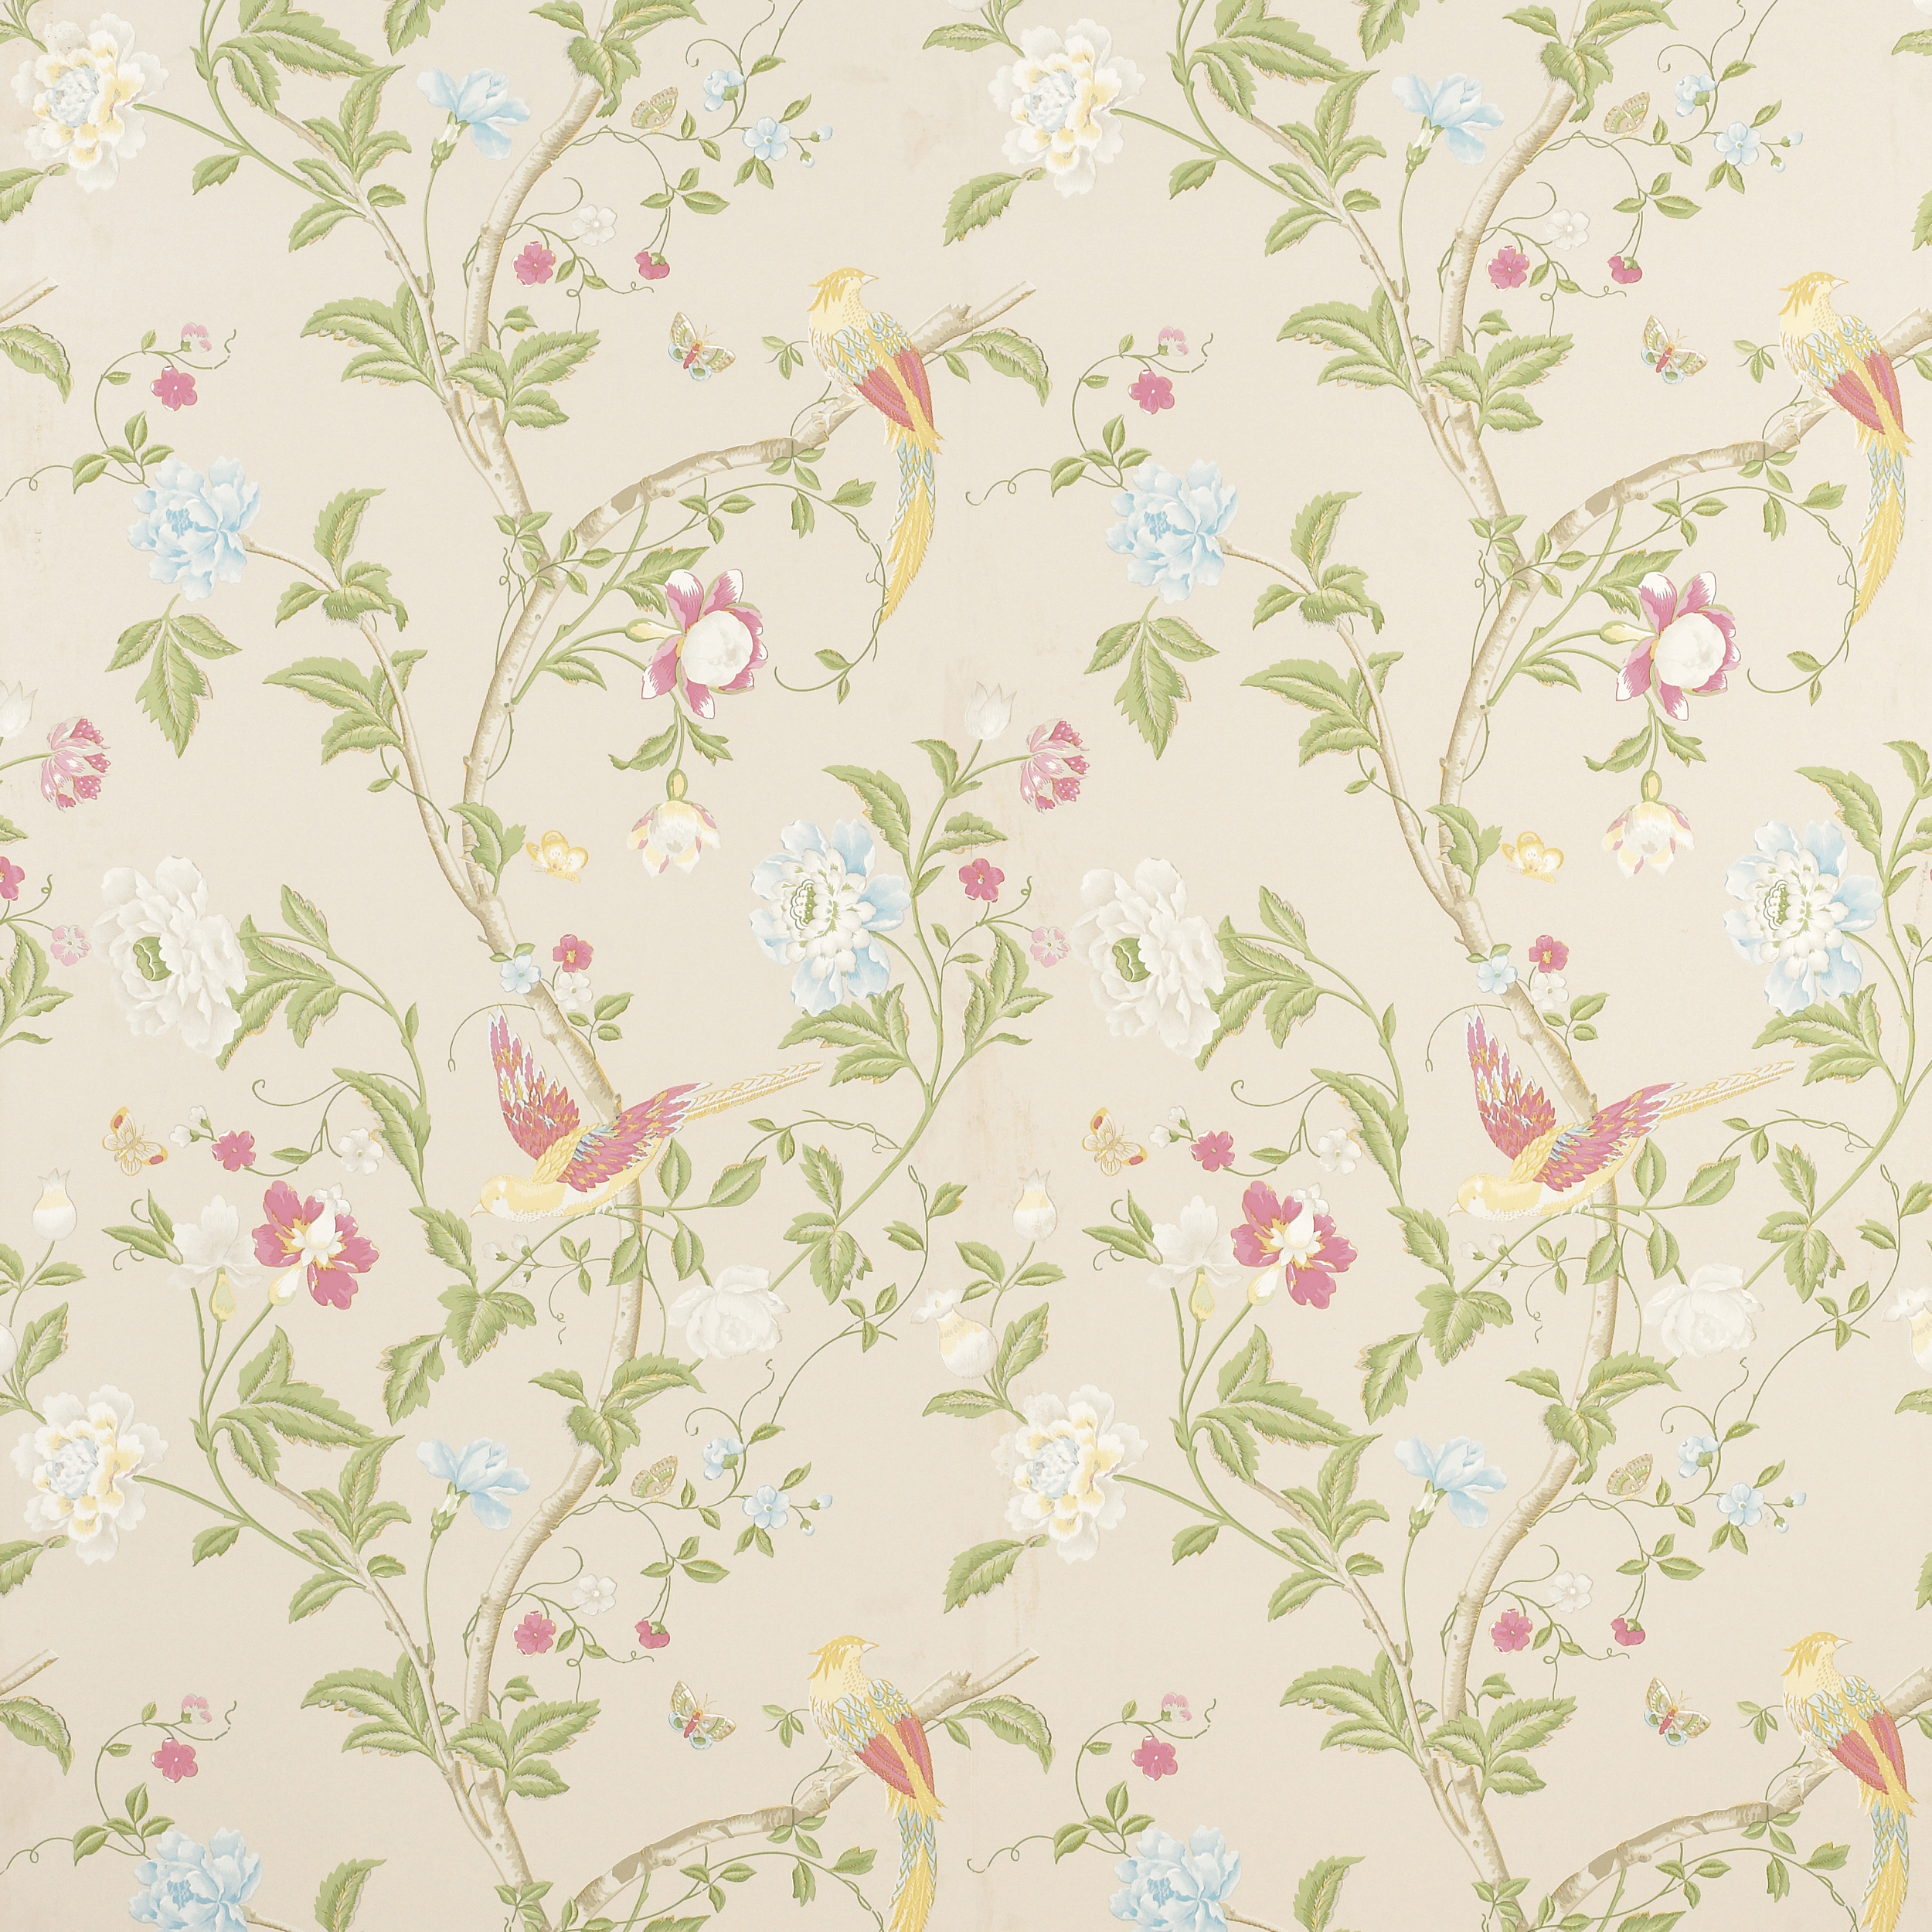 Laura Ashley Wallpaper Bedroom Laura Ashley Summer Palace Wallpaper Wallpapersafari